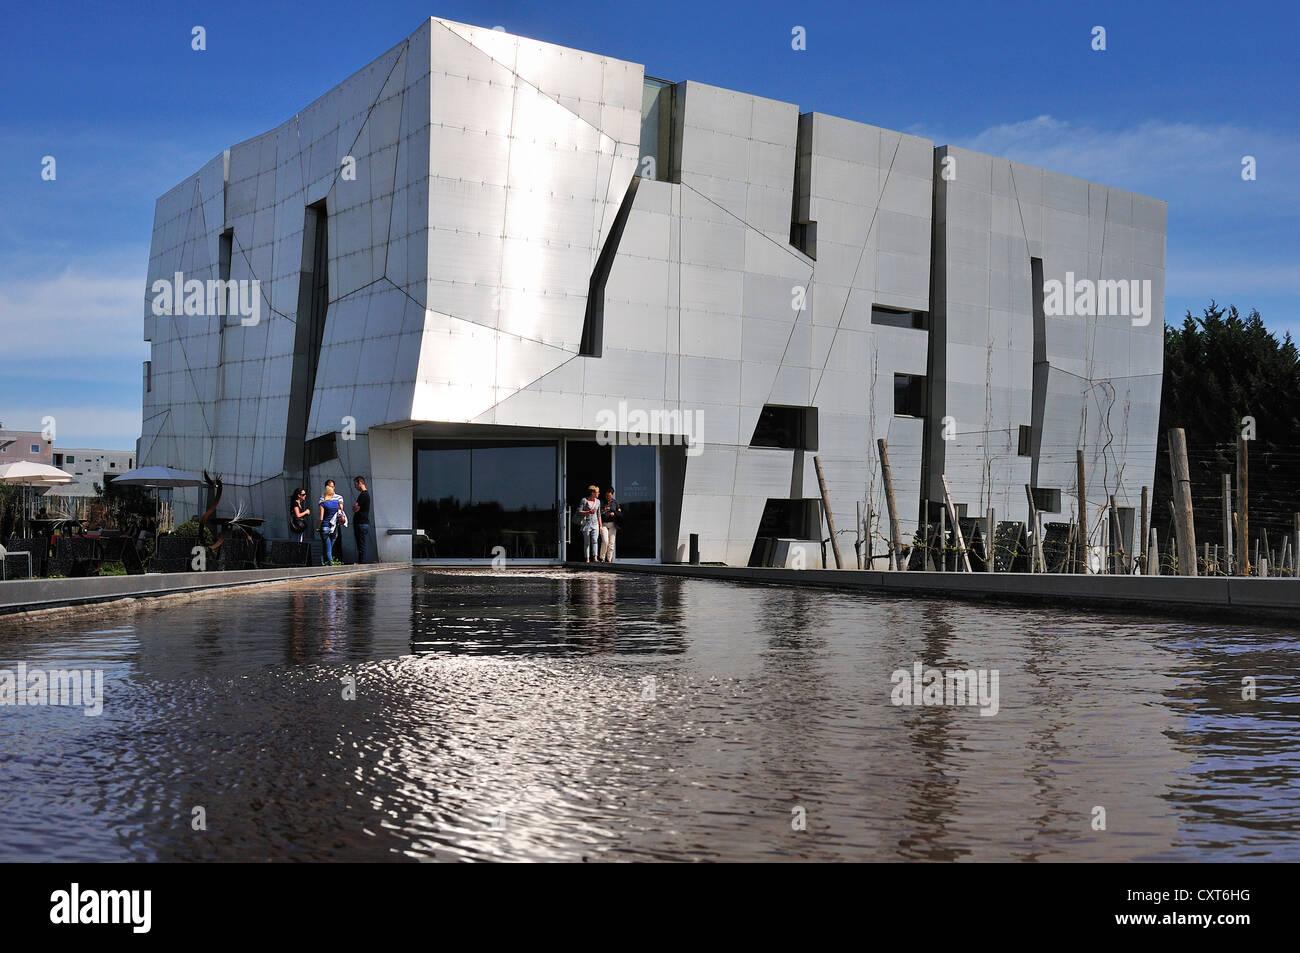 Loisium Kellerwelt building, by architect Steven Holl, Langenlois, Lower Austria, Austria, Europe - Stock Image